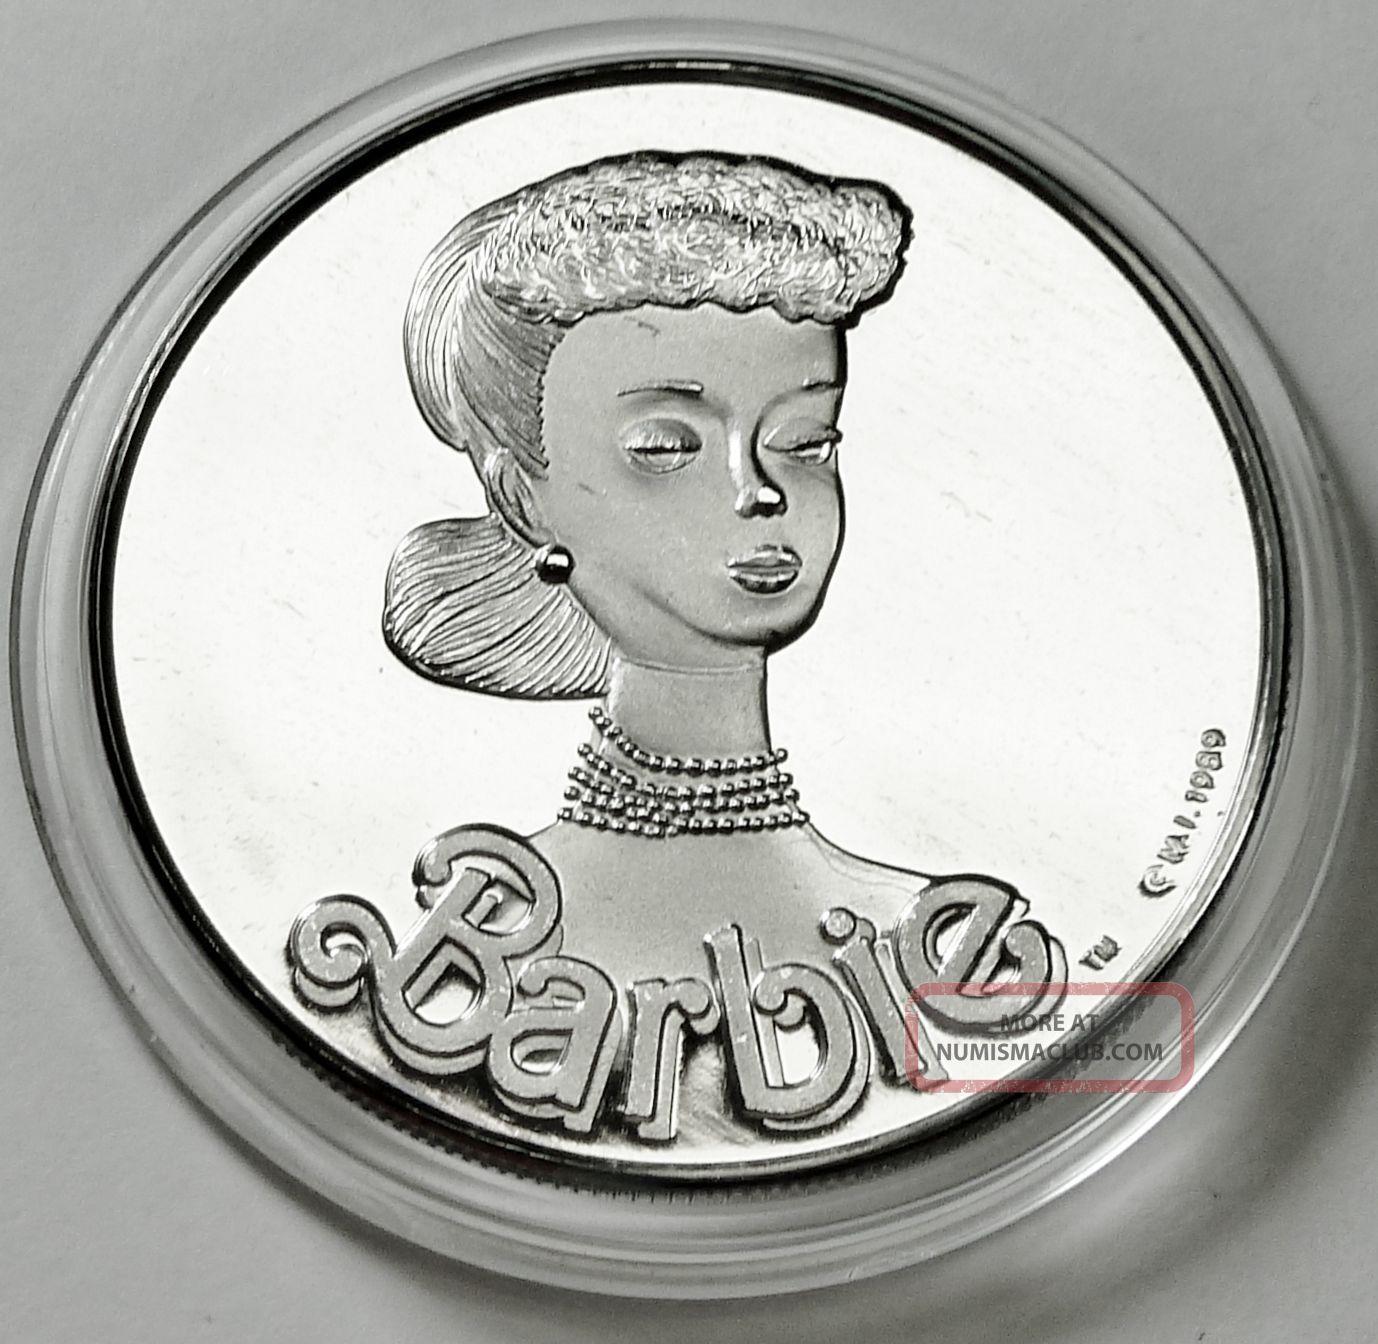 Barbie 30th Anniversary 1 Troy Oz 999 Fine Silver Coin